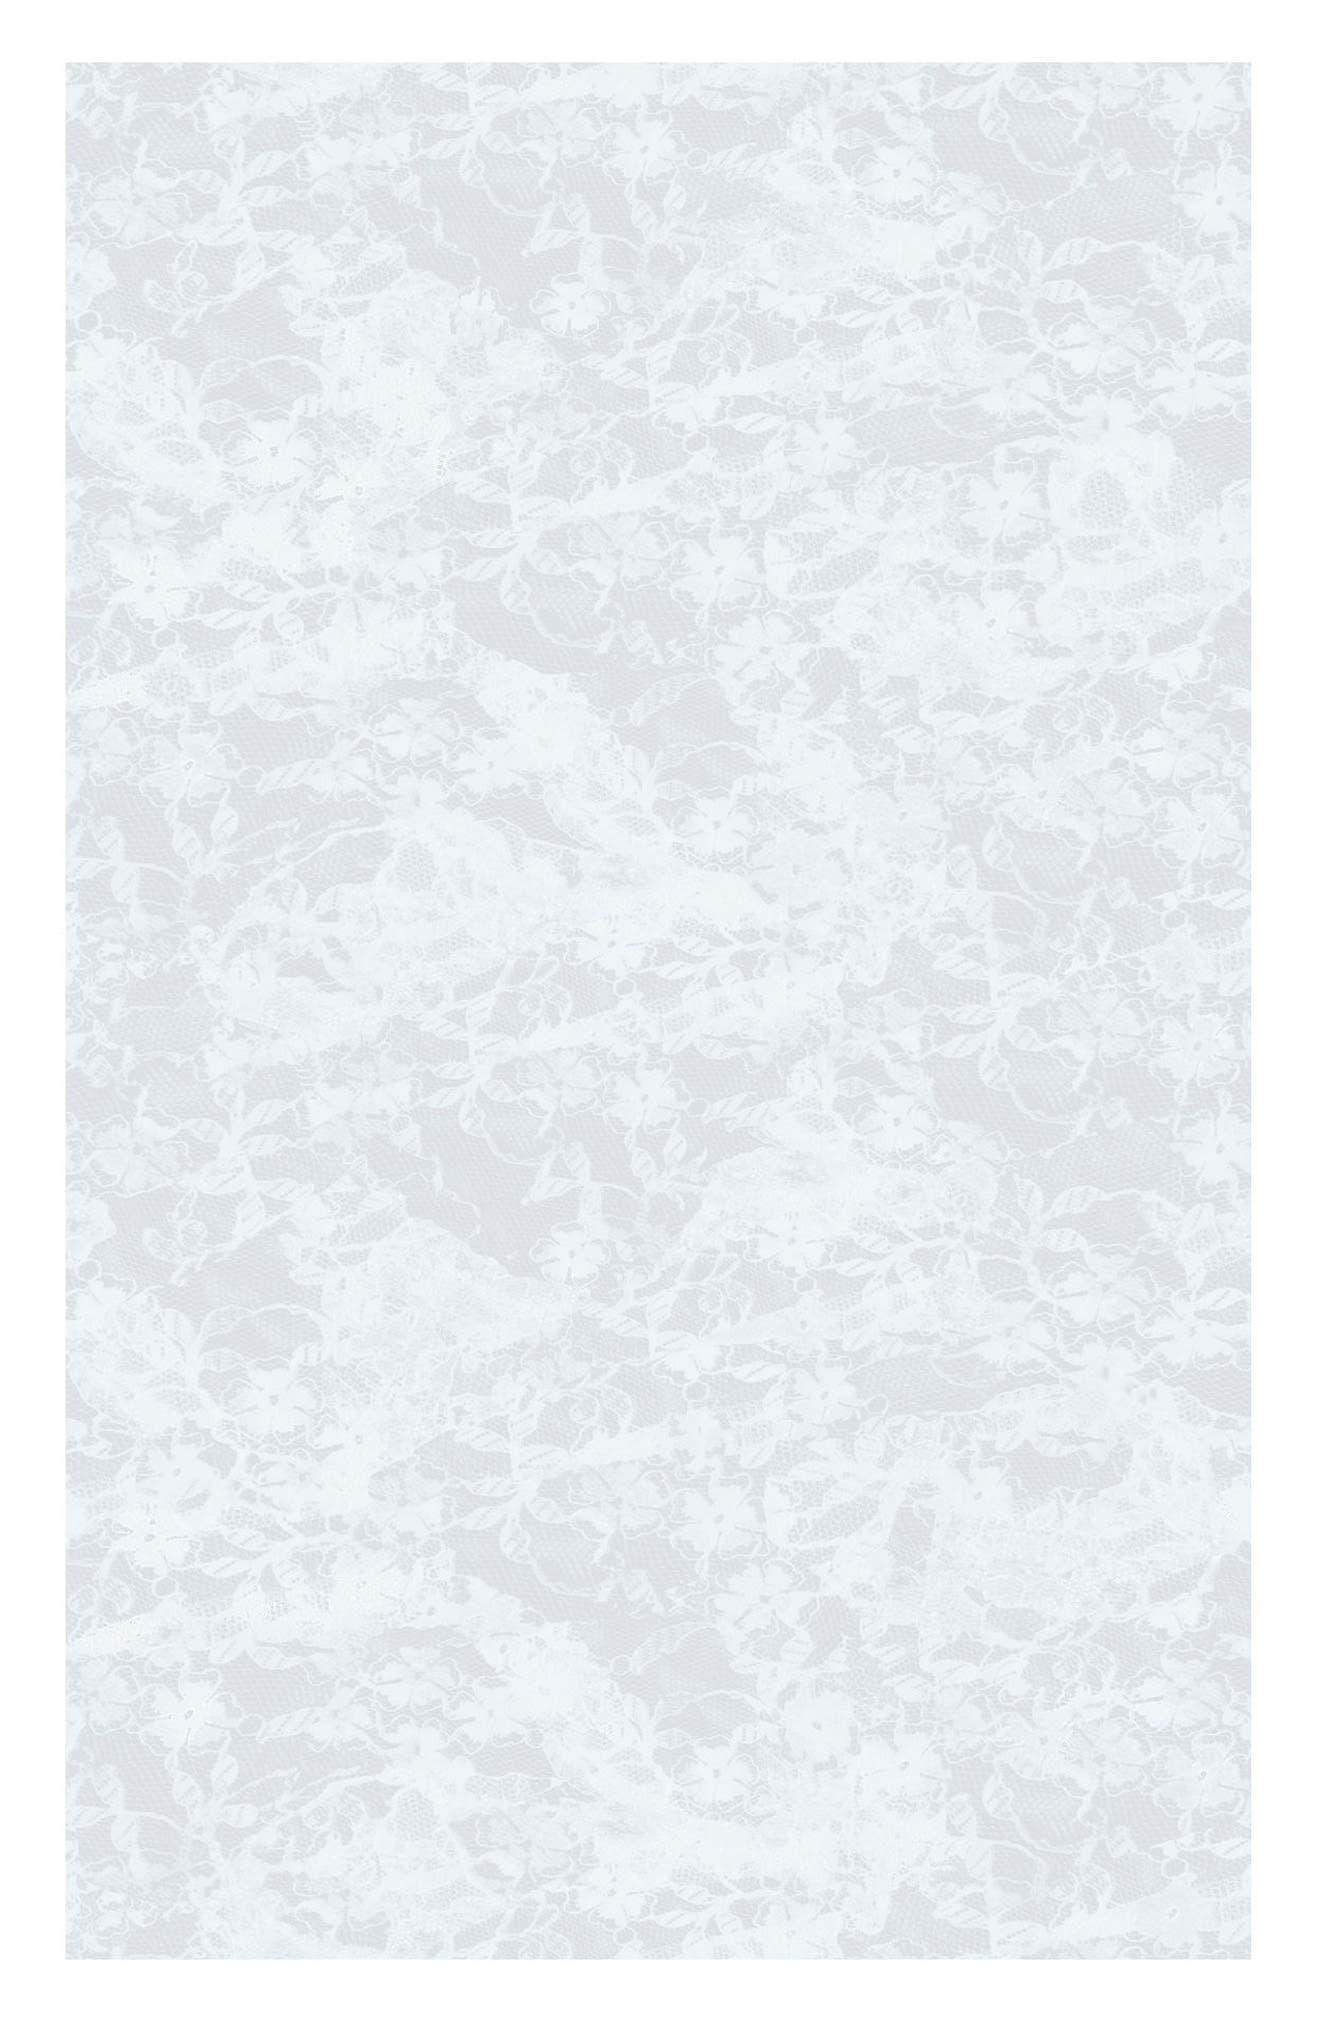 Alternate Image 1 Selected - Wallpops Lace  Peel & Stick Vinyl Window Cling